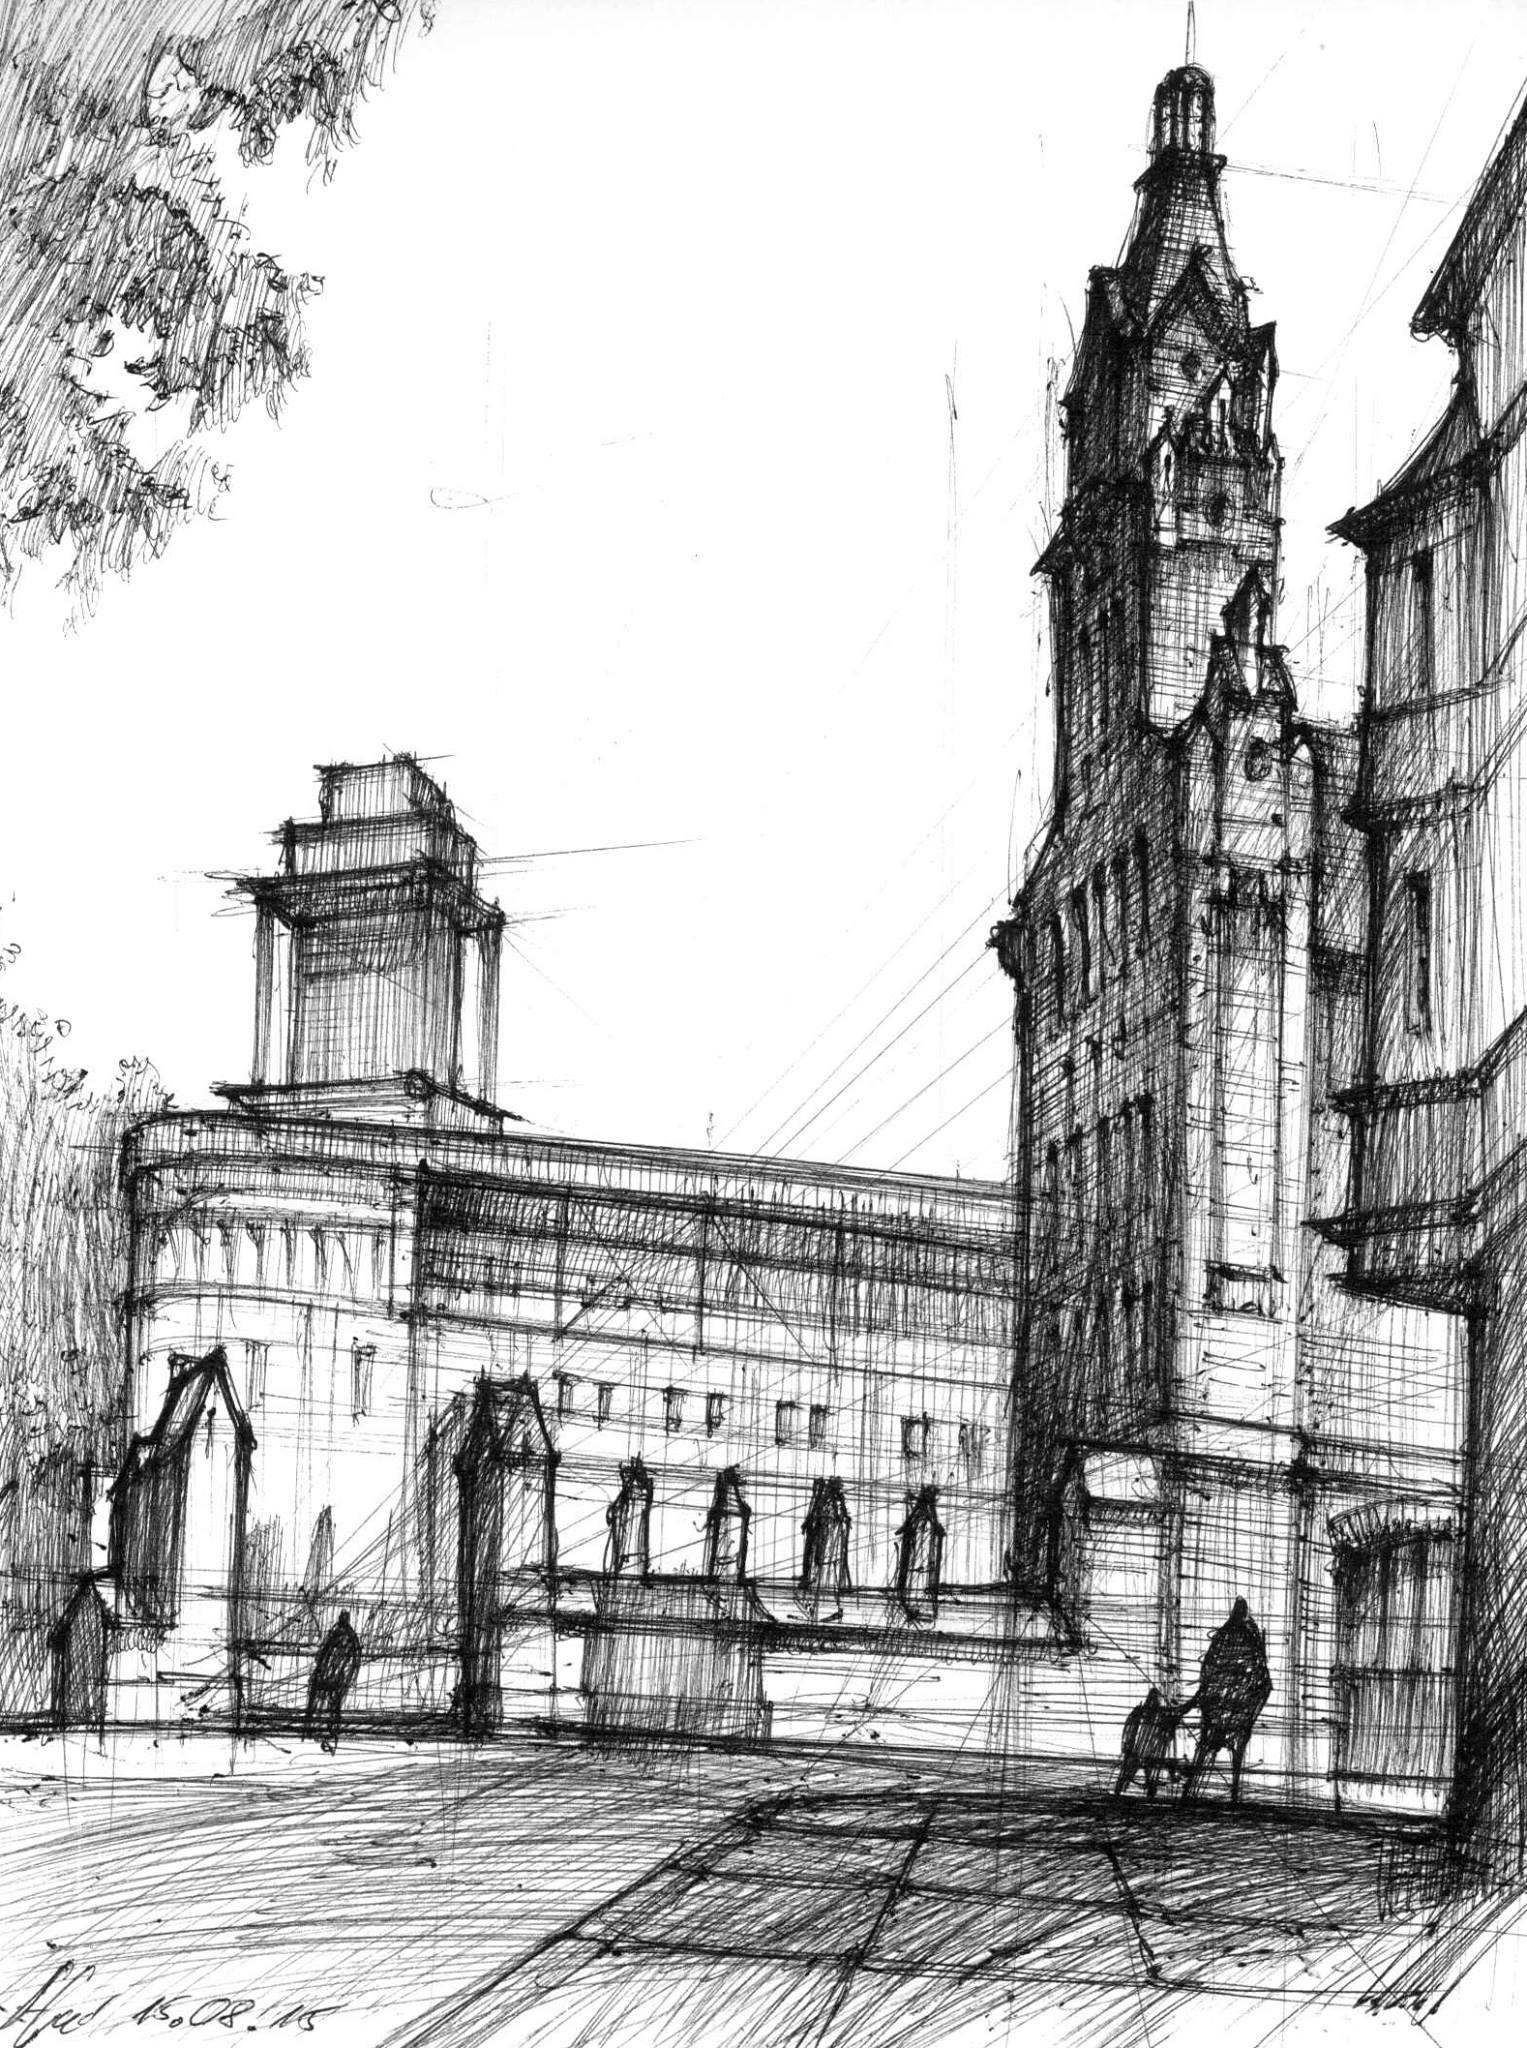 Visualizations-Arch com » Sketches